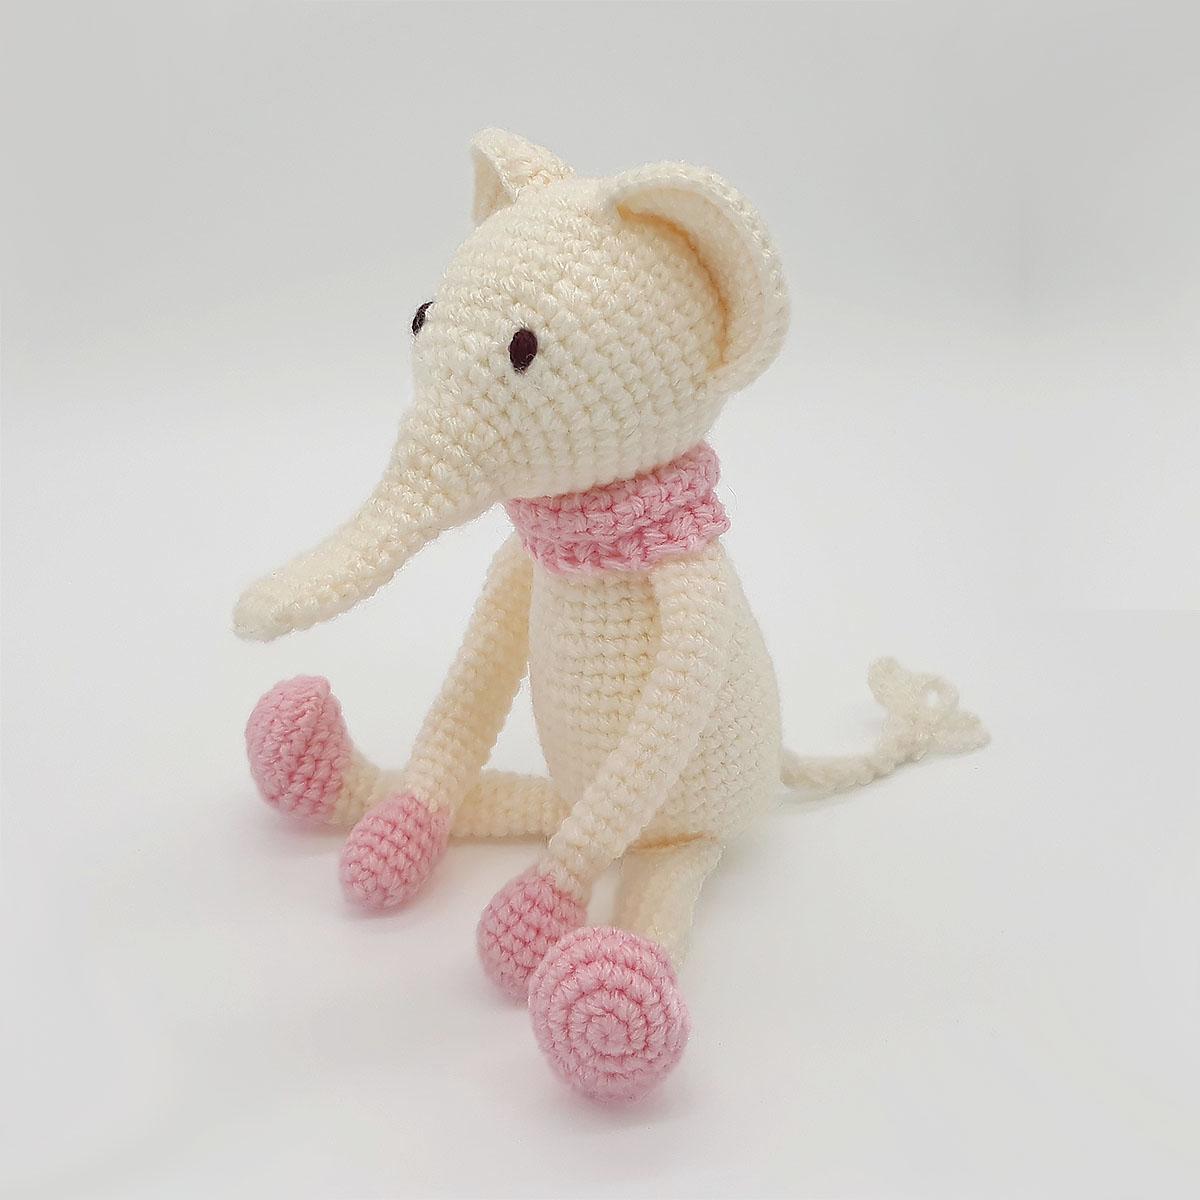 Stuffed Elephant / Crochet Elephant / Amigurumi Elephant ... | 1200x1200